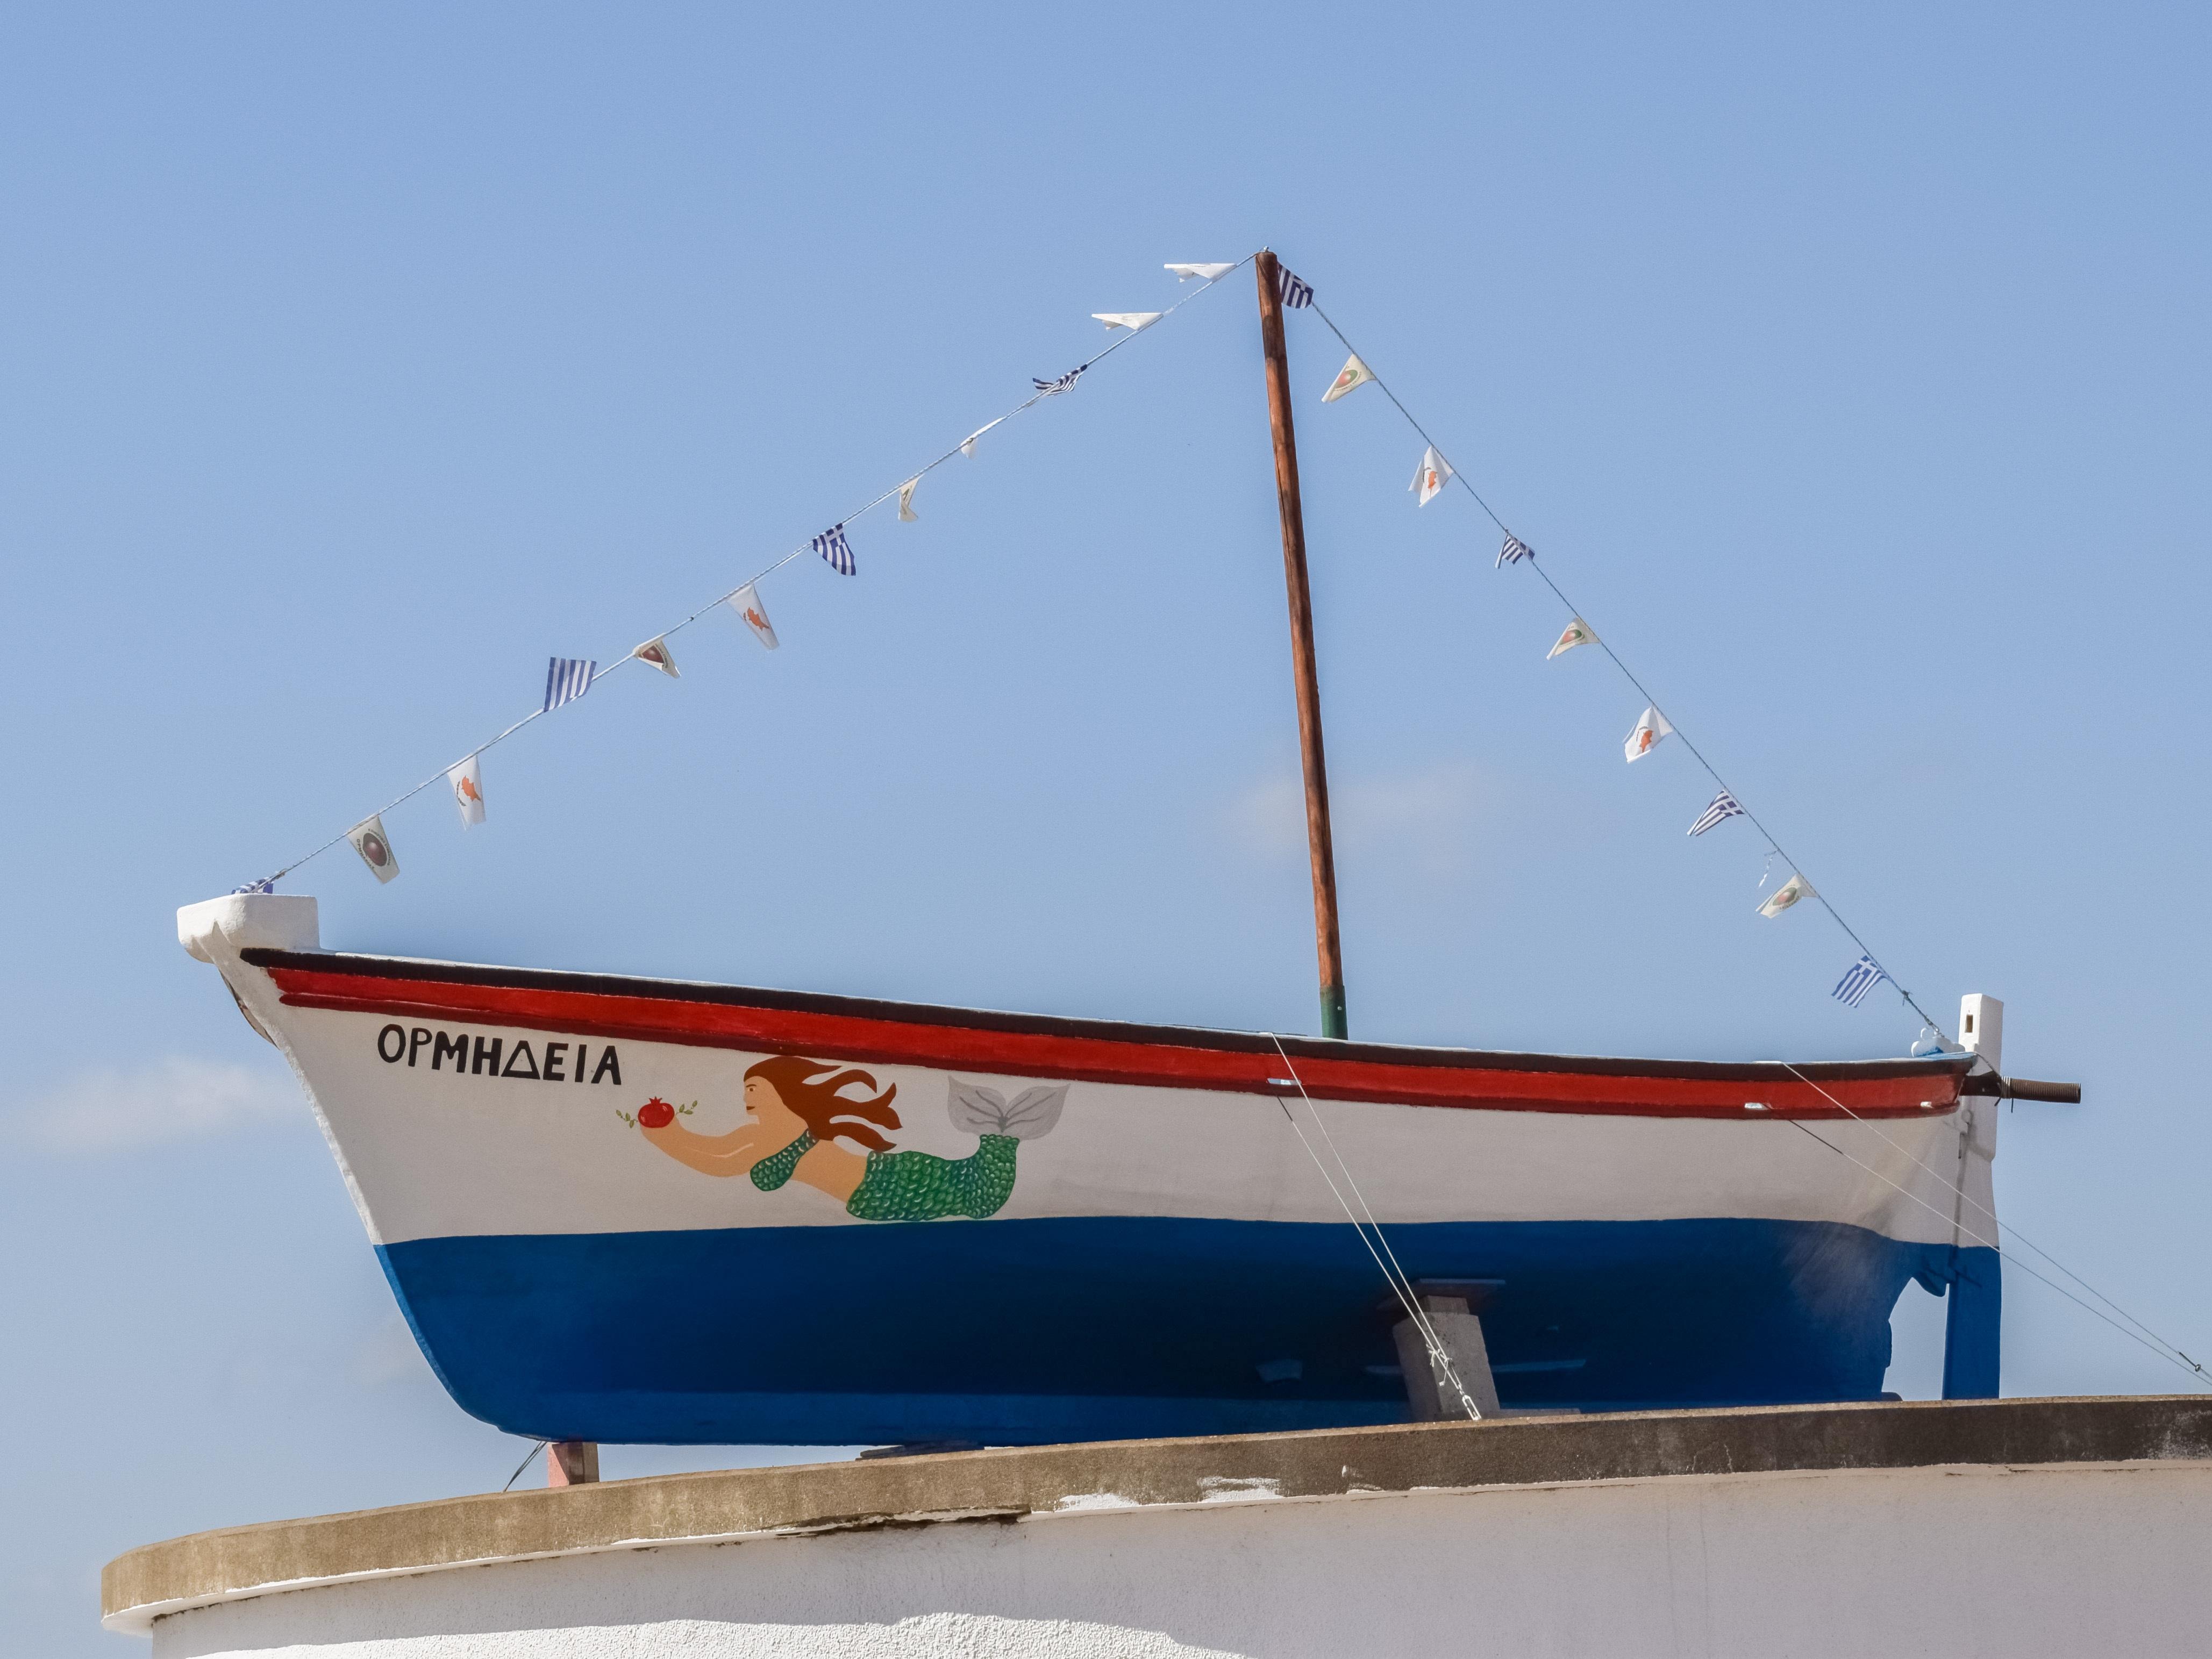 barco enviar pueblo decoracin vehculo mstil velero barco de pesca vela motivo goleta tradicional sirena